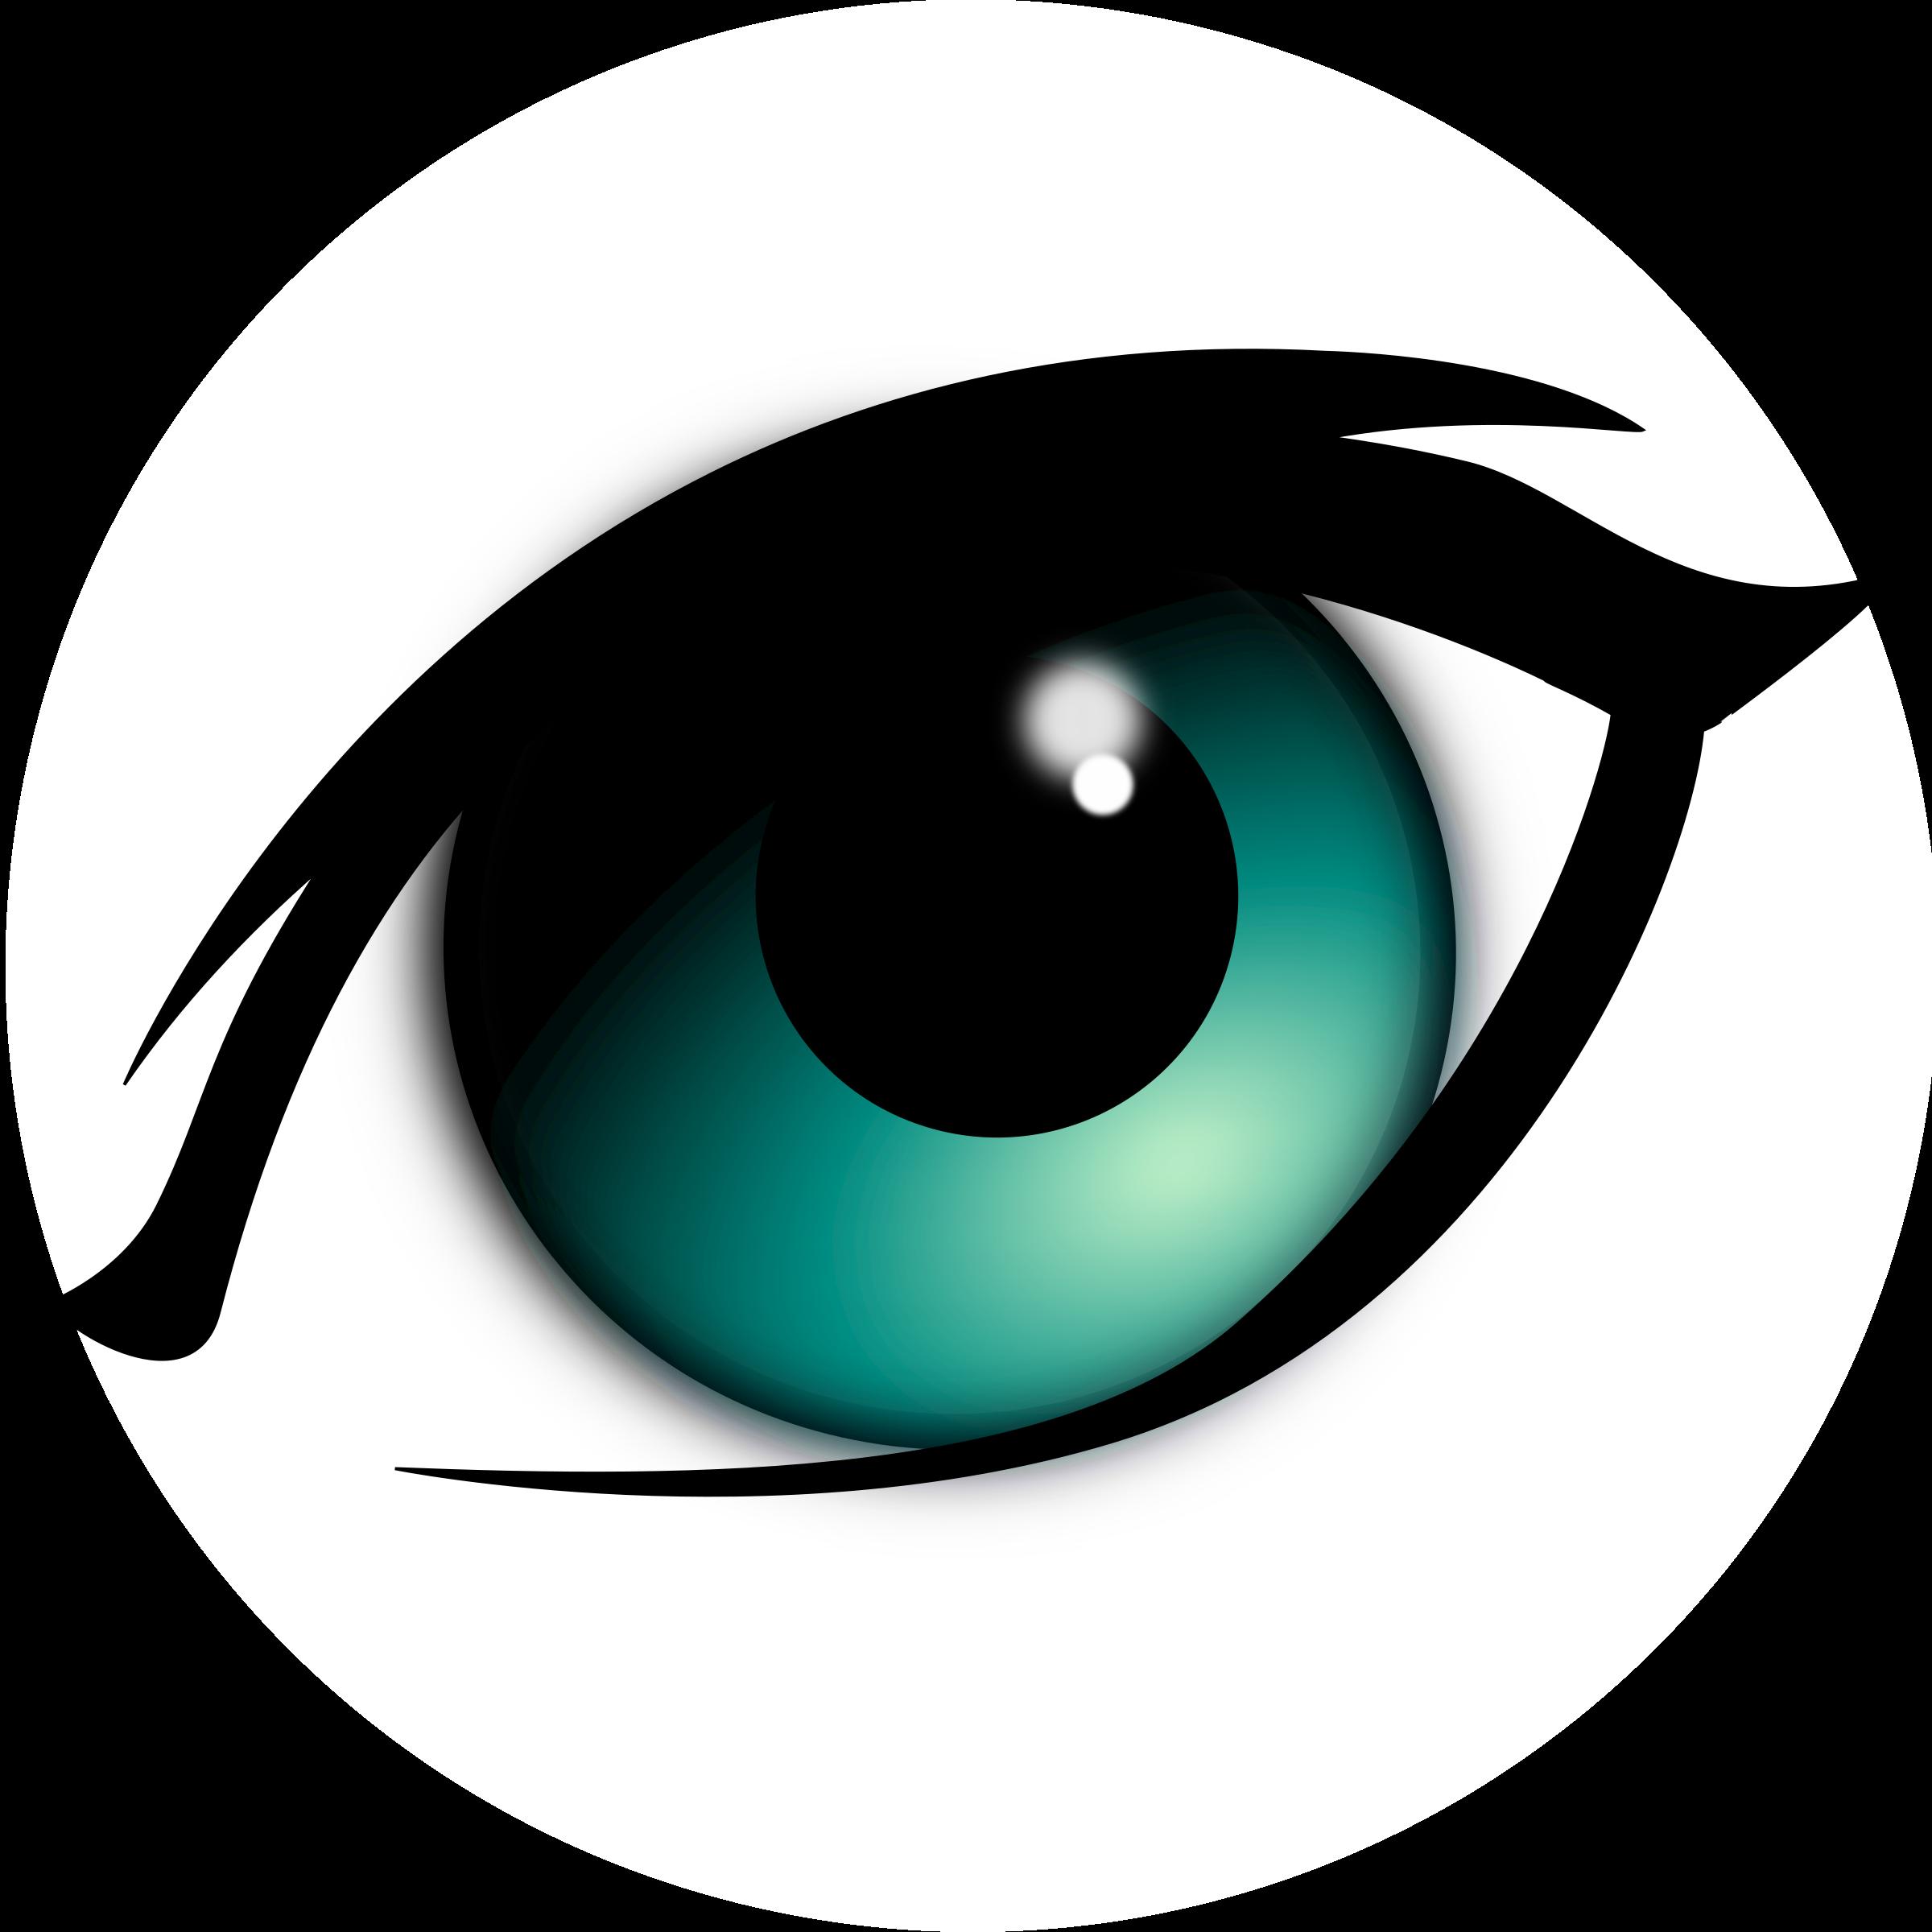 Number 1 clipart eye. Narrowhouse cartoon remix coxartprod